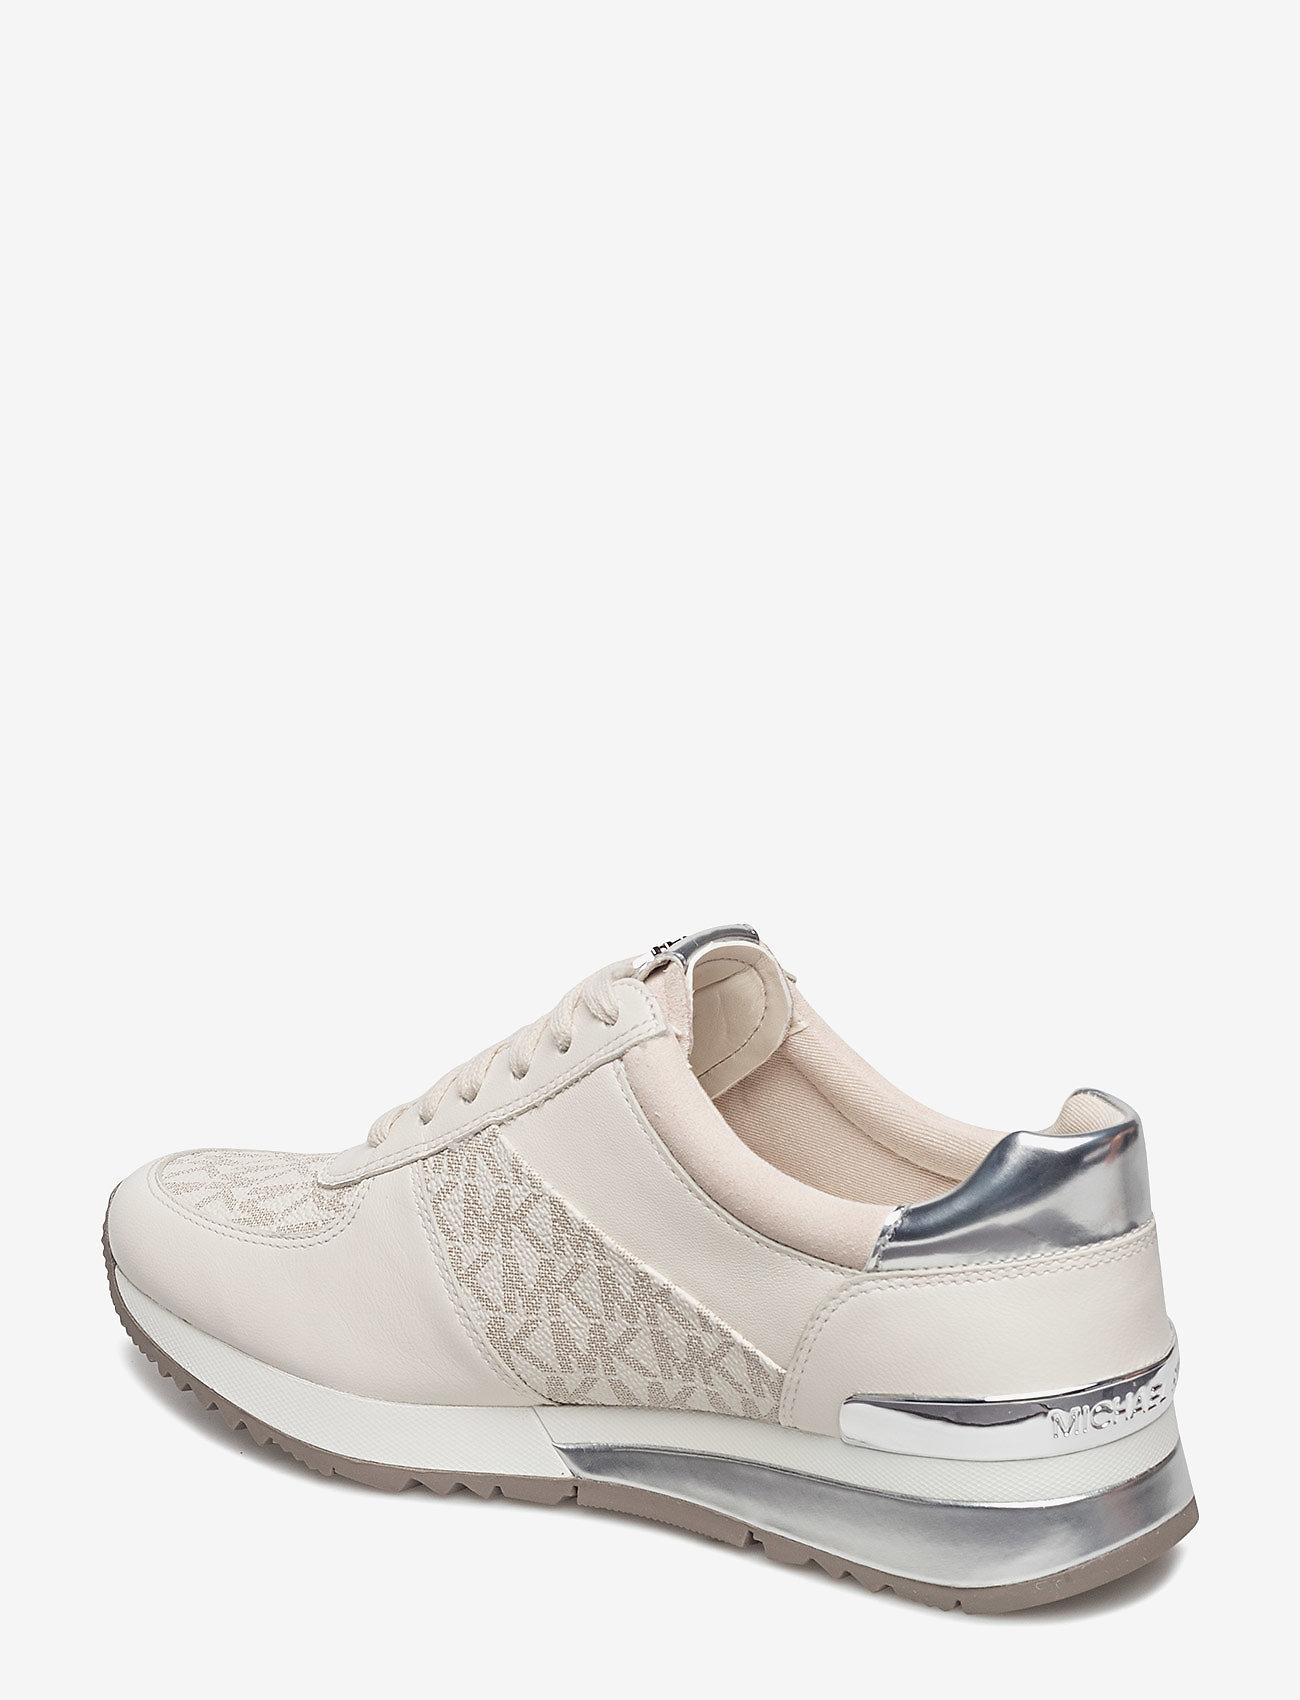 Michael Kors Shoes Allie Wrap Trainer - Sneakers Vanilla